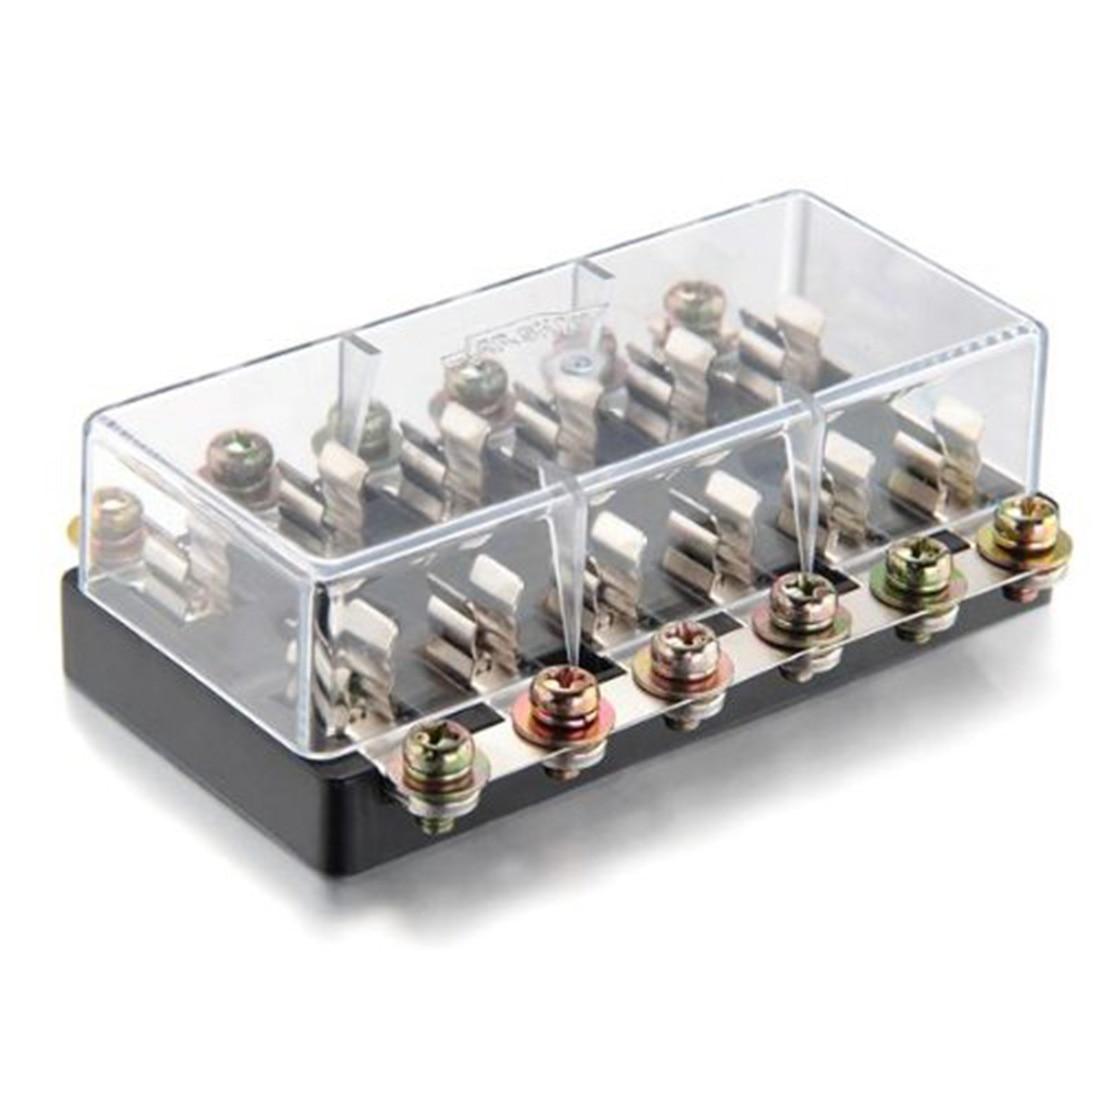 medium resolution of dewtreetali new universal 12v 6 way fusebox fuse blade fuse box fuseholder kit car boat